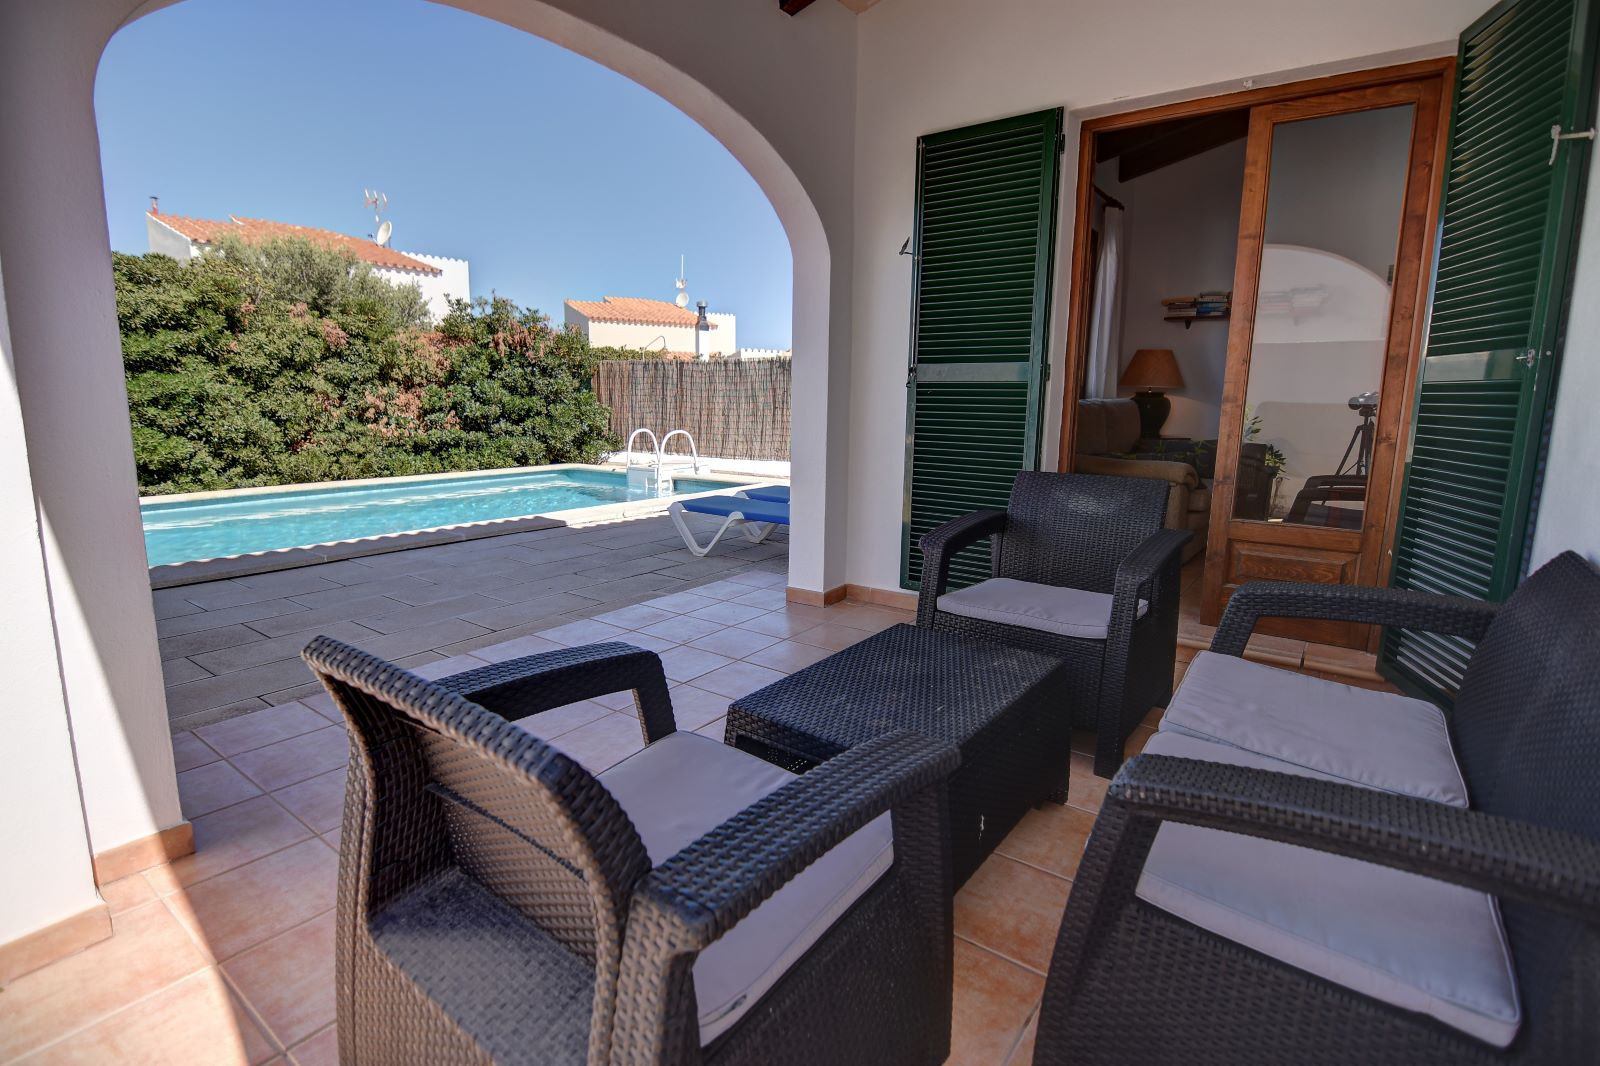 Villa in Cap D'Artruitx Ref: H2589 2